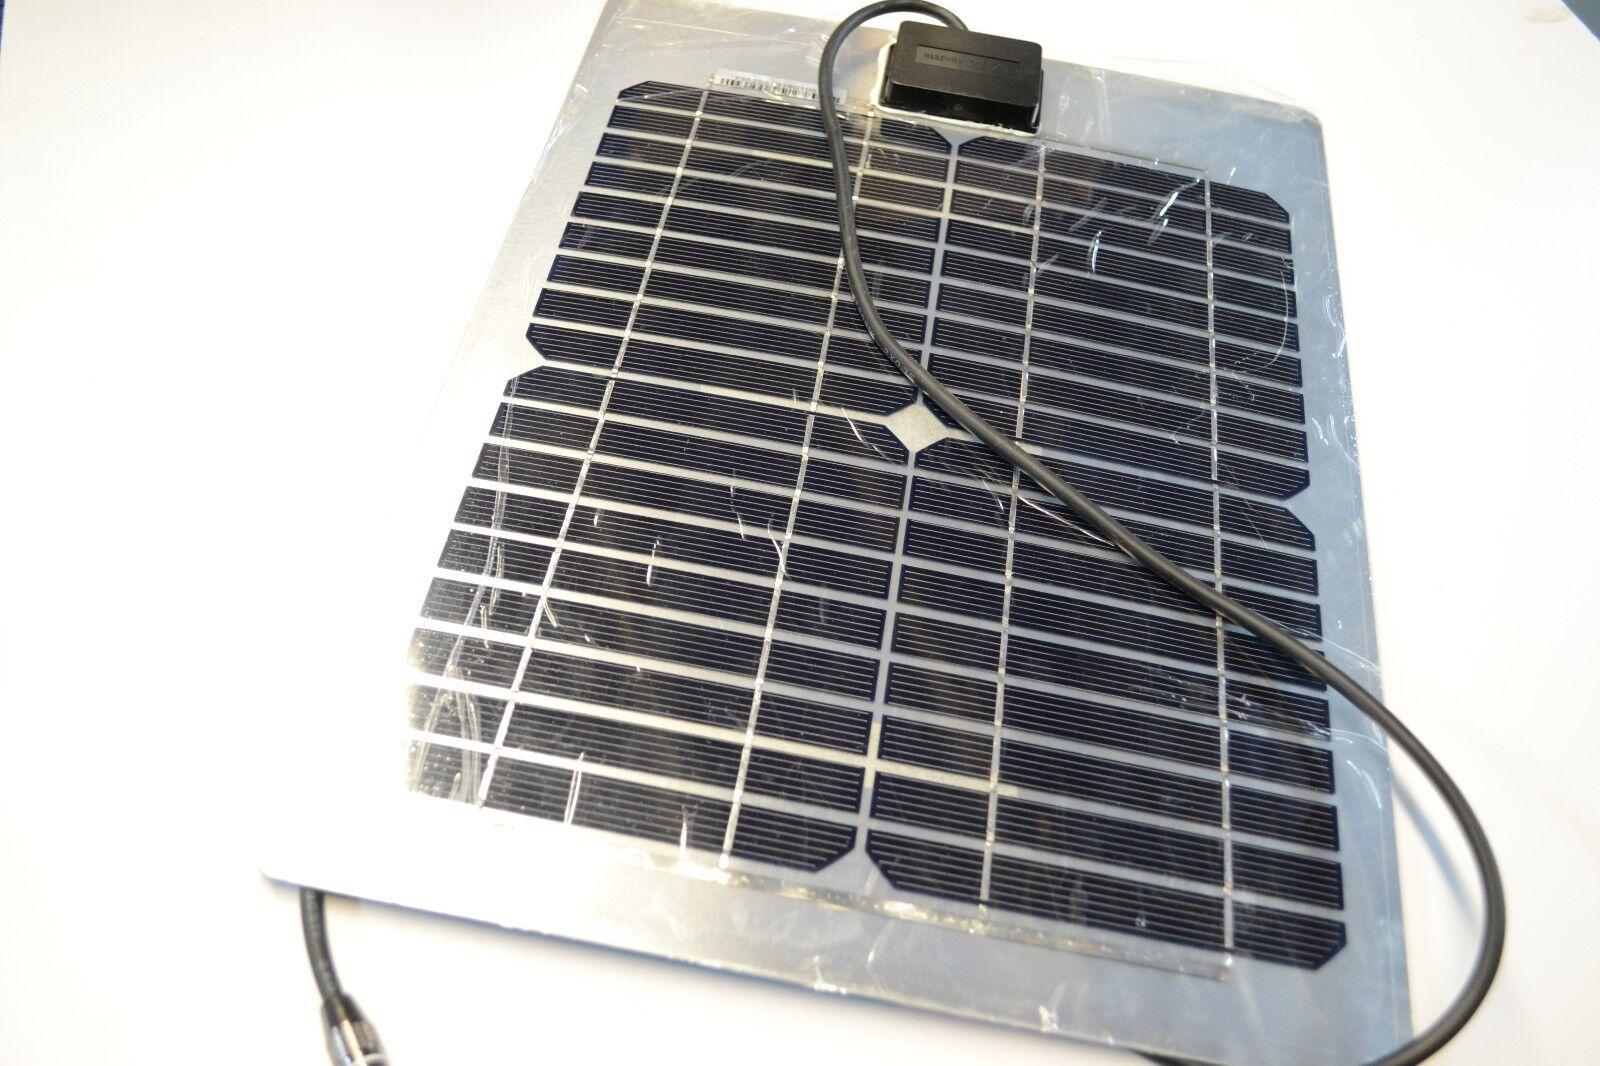 Panel solar para adaptarse a la pesca Technics Microcat technicat CEBO BARCO PILAS